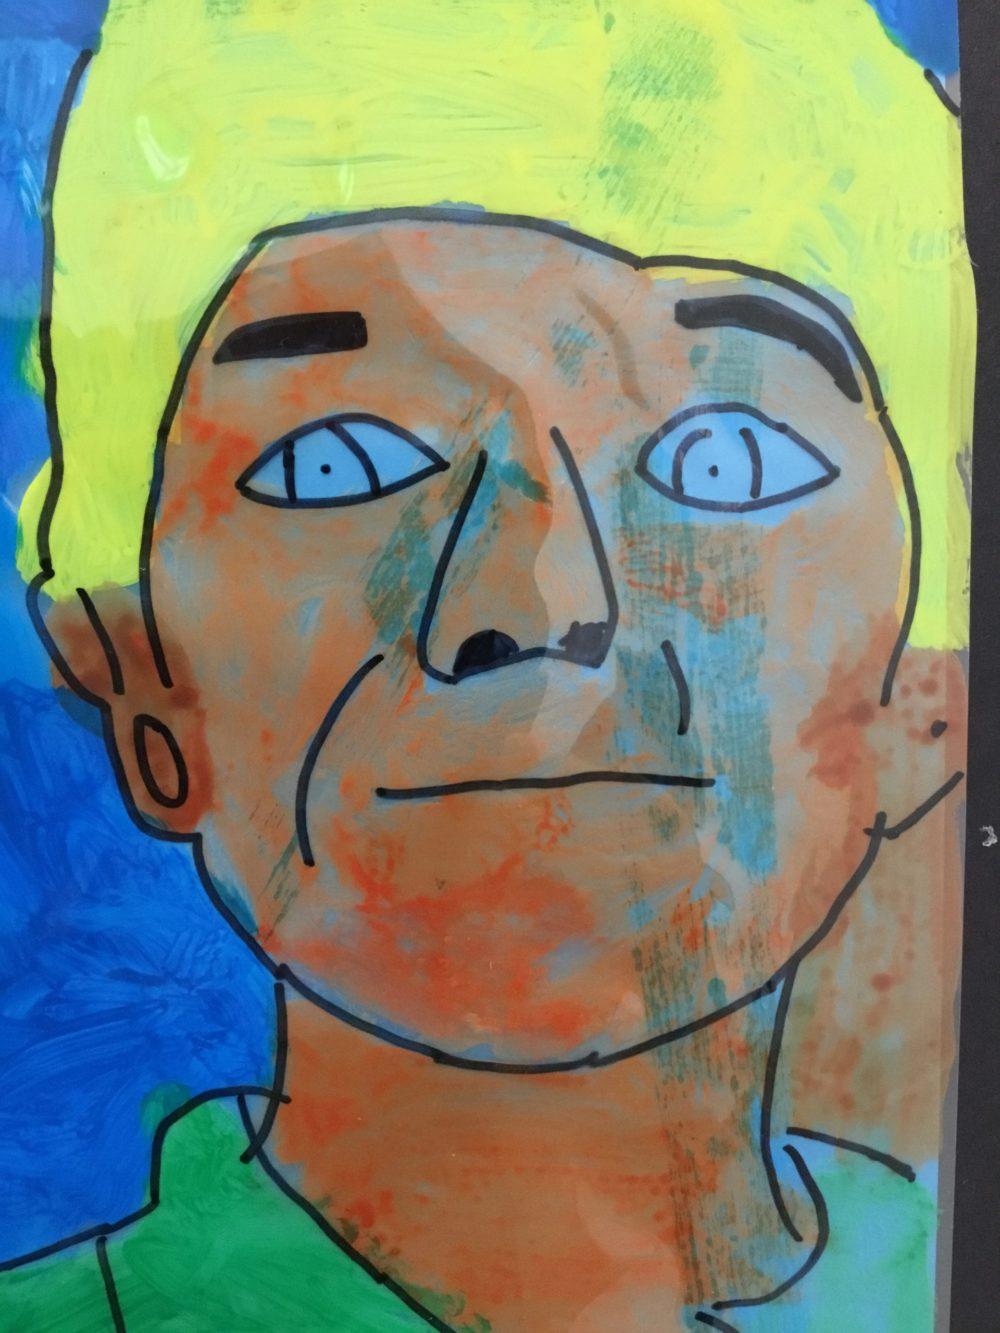 backpainted portrait on acetate using simple colour scheme